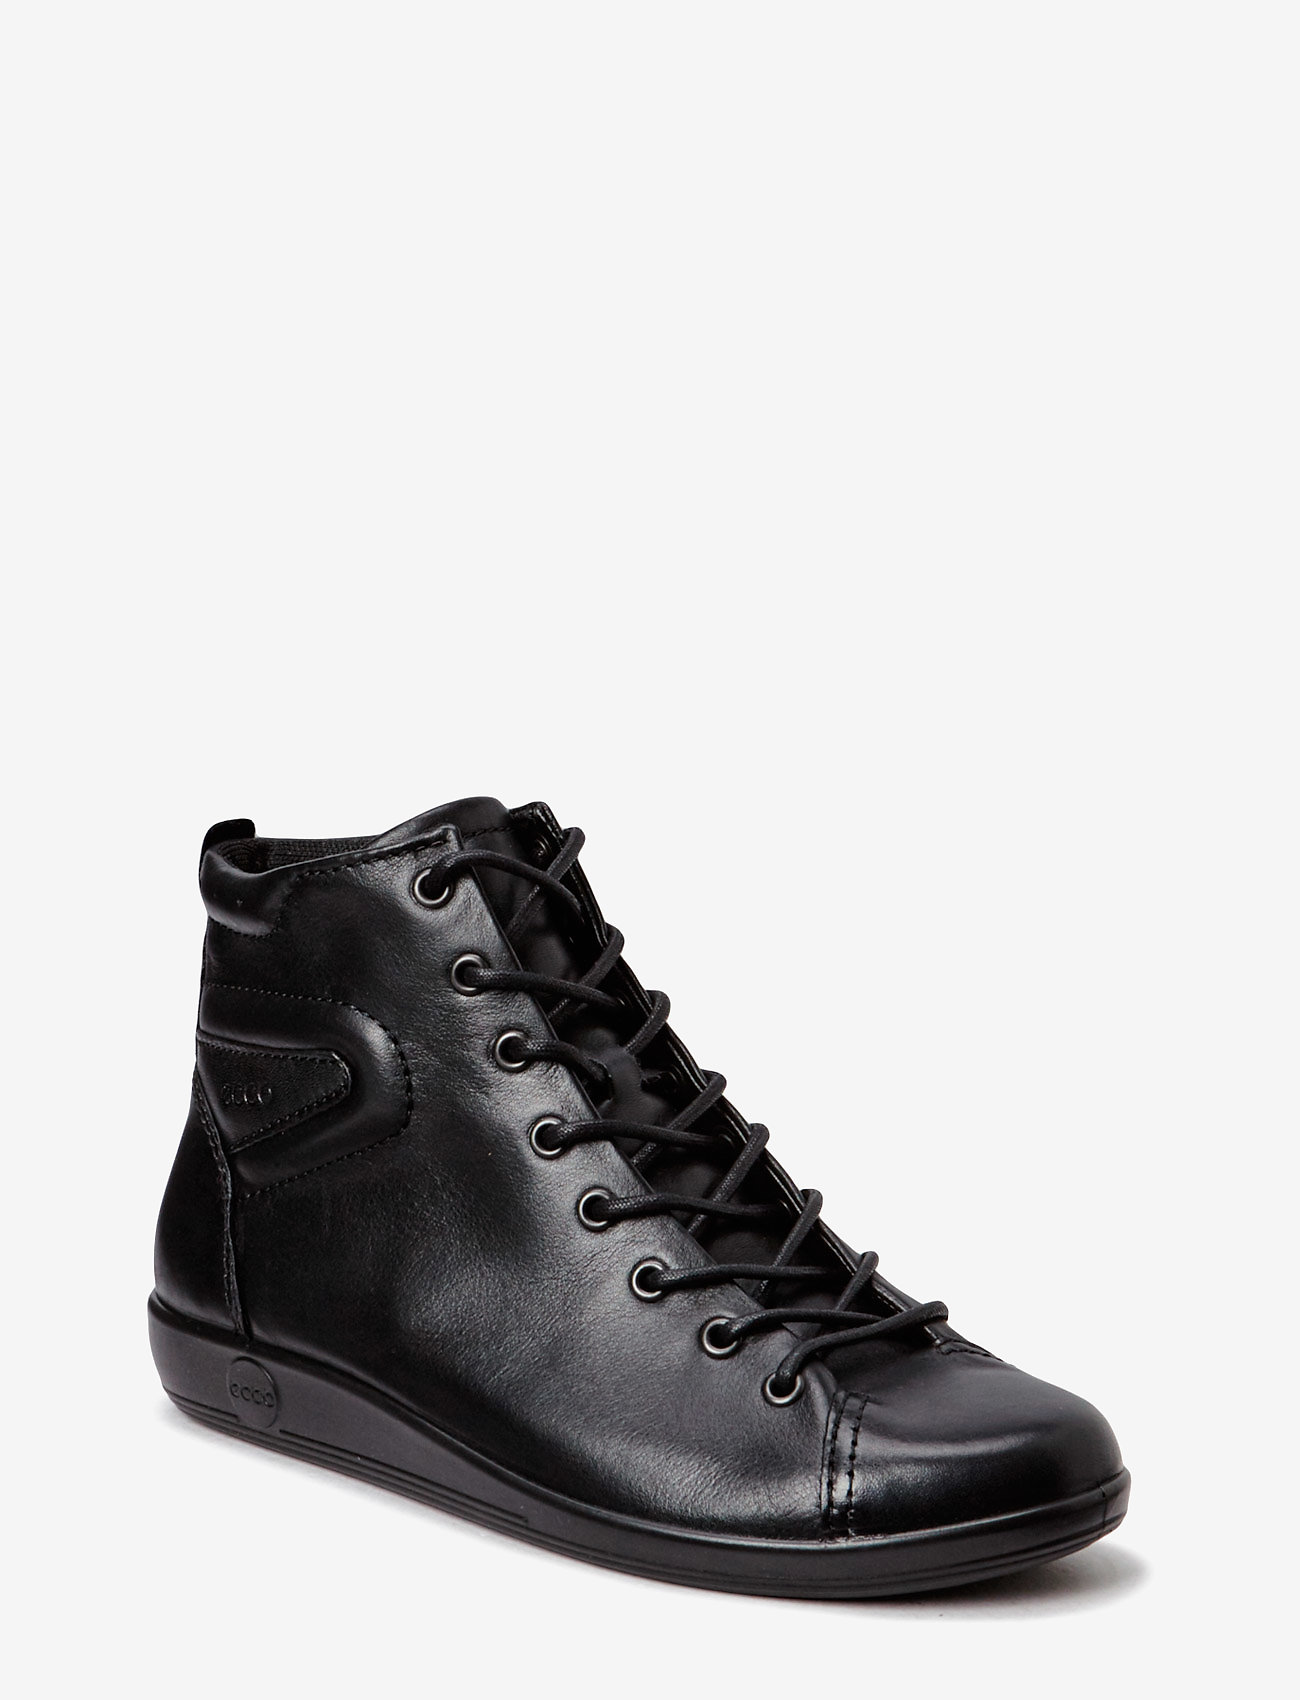 ECCO - SOFT 2.0 - sportiska stila apavi ar paaugstinātu potītes daļu - black with black sole - 0